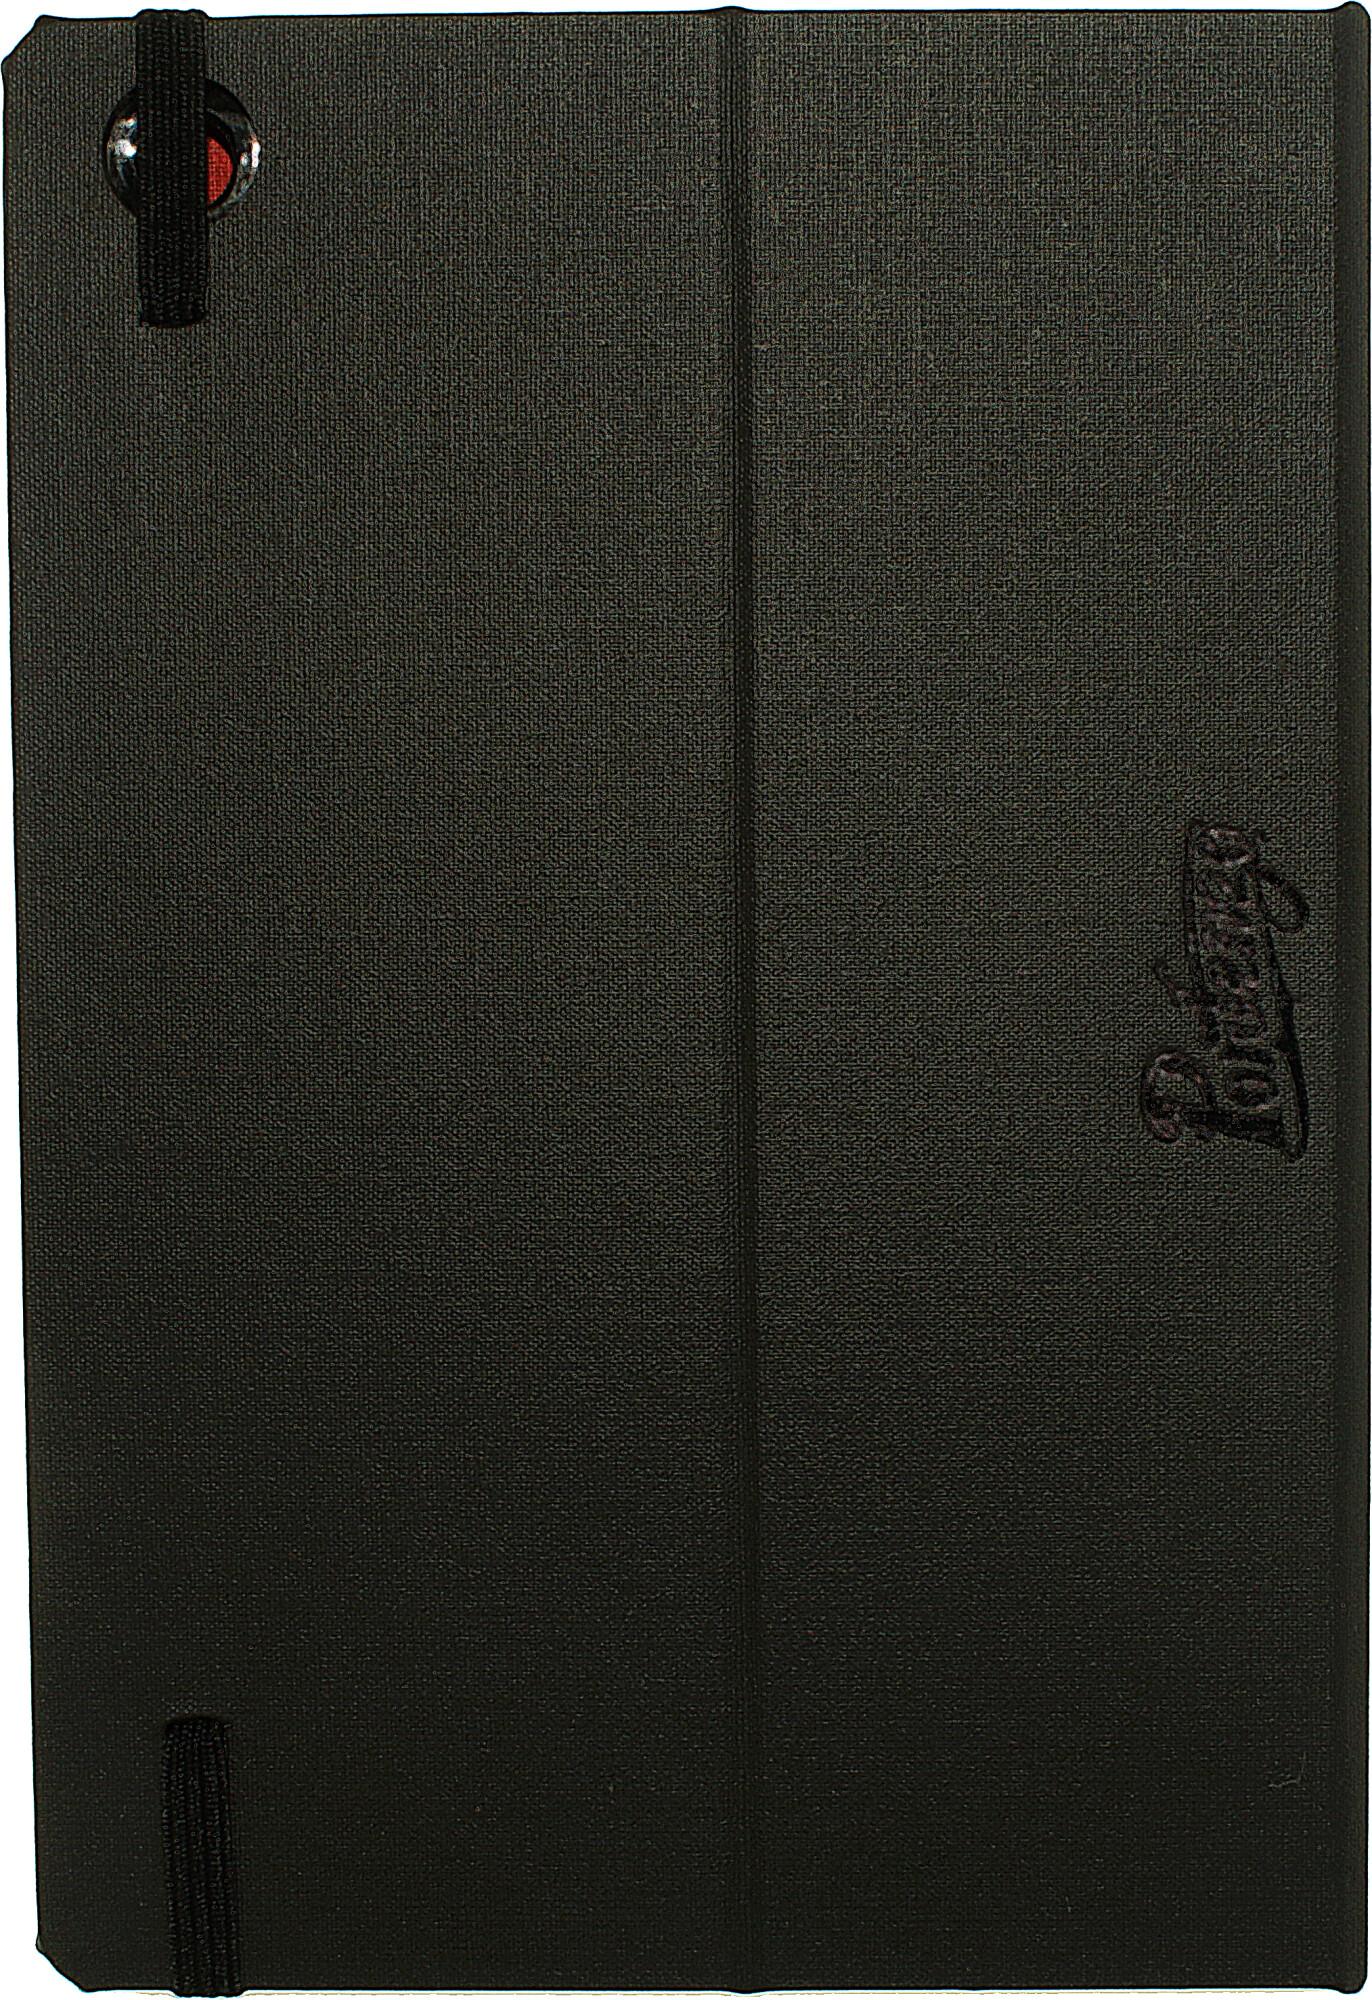 Portenzo Ipad Mini 1,2,3 Tablet Case AT16001-M123-100